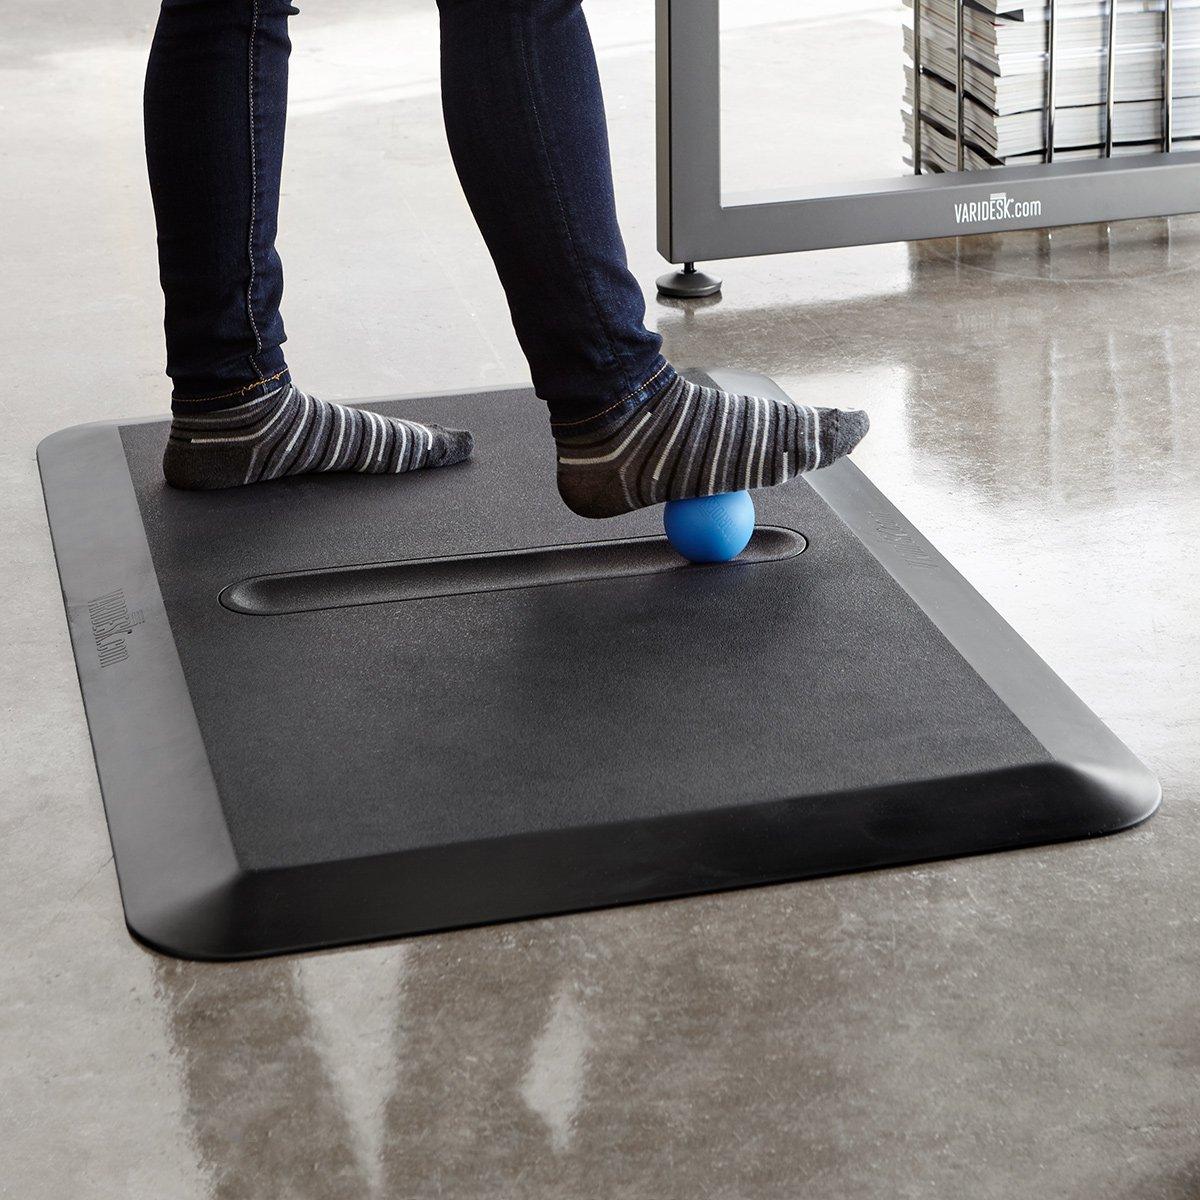 Commercial Kitchen Floor Mats Amazoncom Comfort Mats Home Kitchen